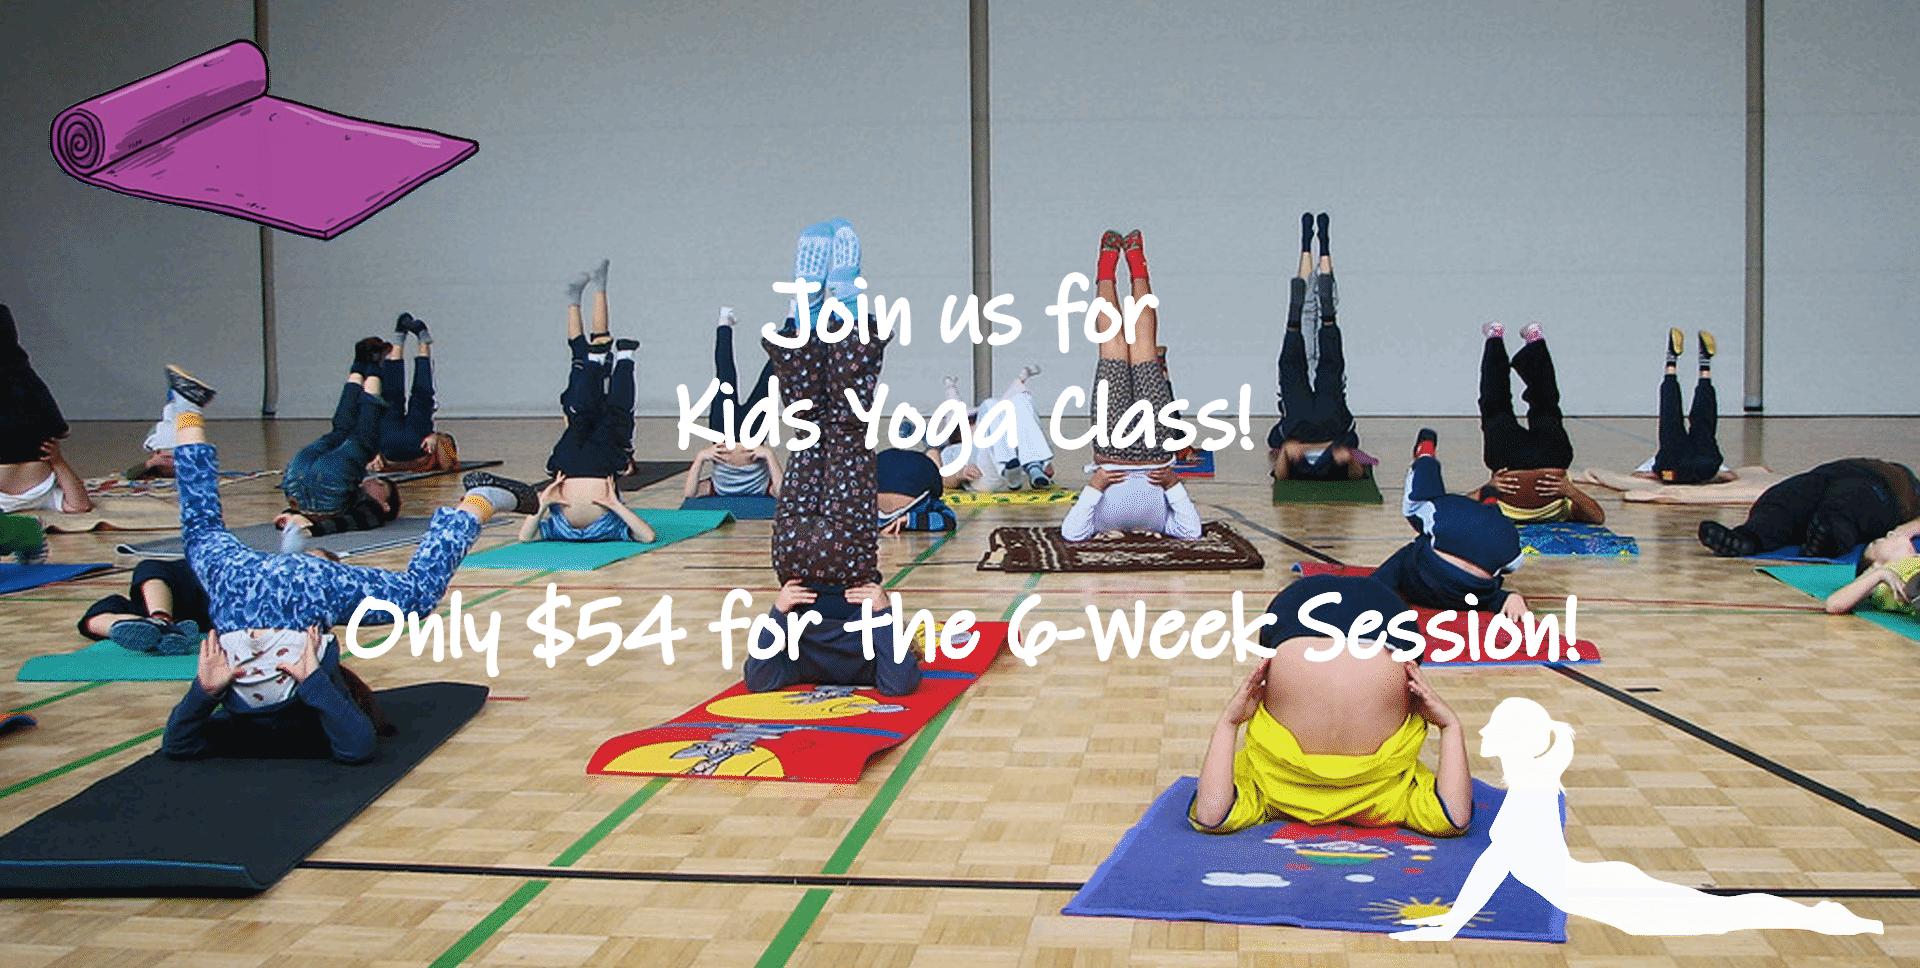 kids yoga kenosha, yoga class for kids kenosha, kenosha yoga